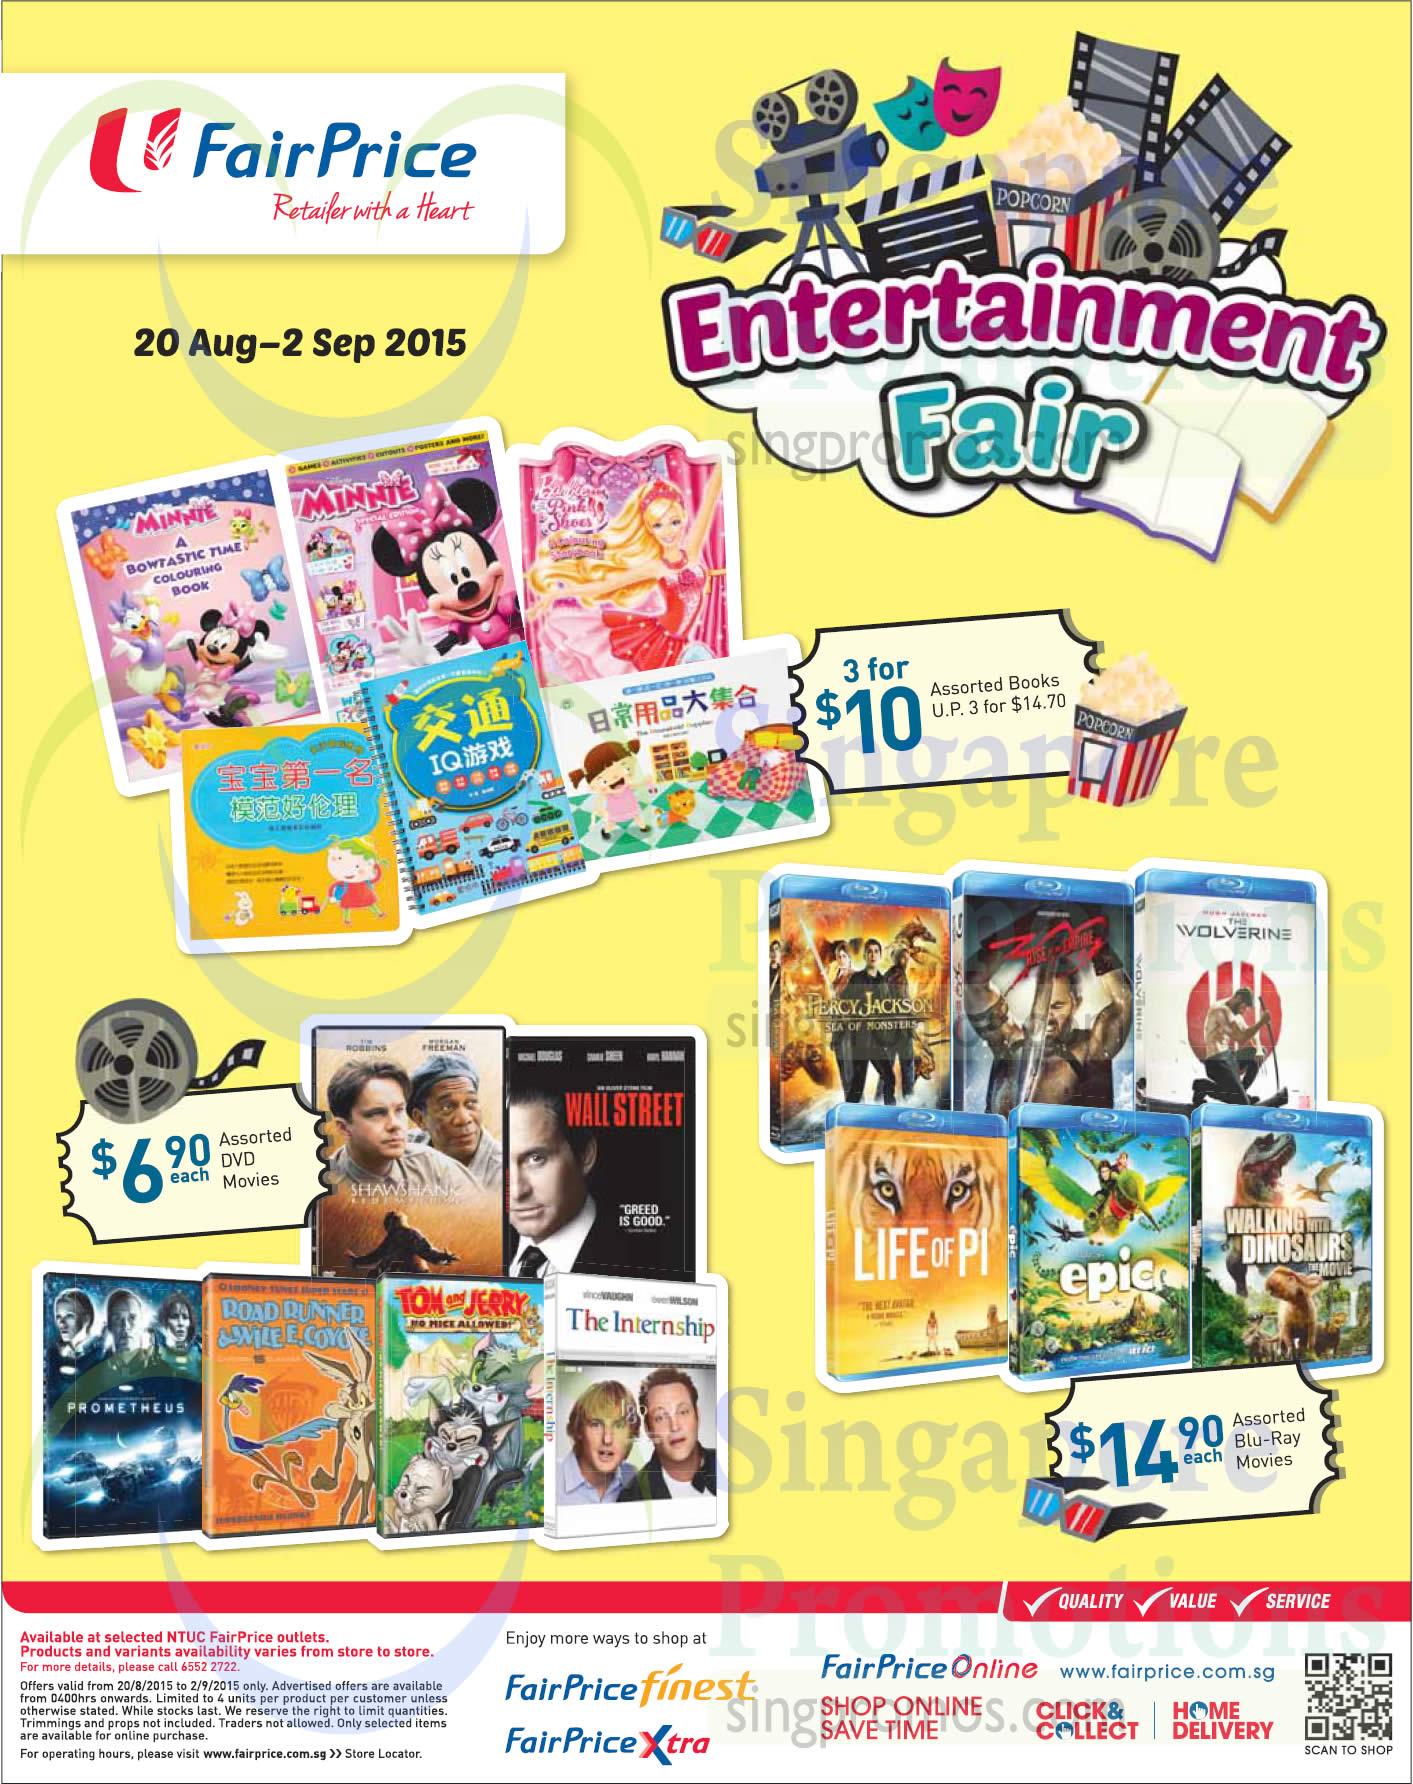 Entertainment Fair Assorted Books, Blu Ray Movies, DVD Movies